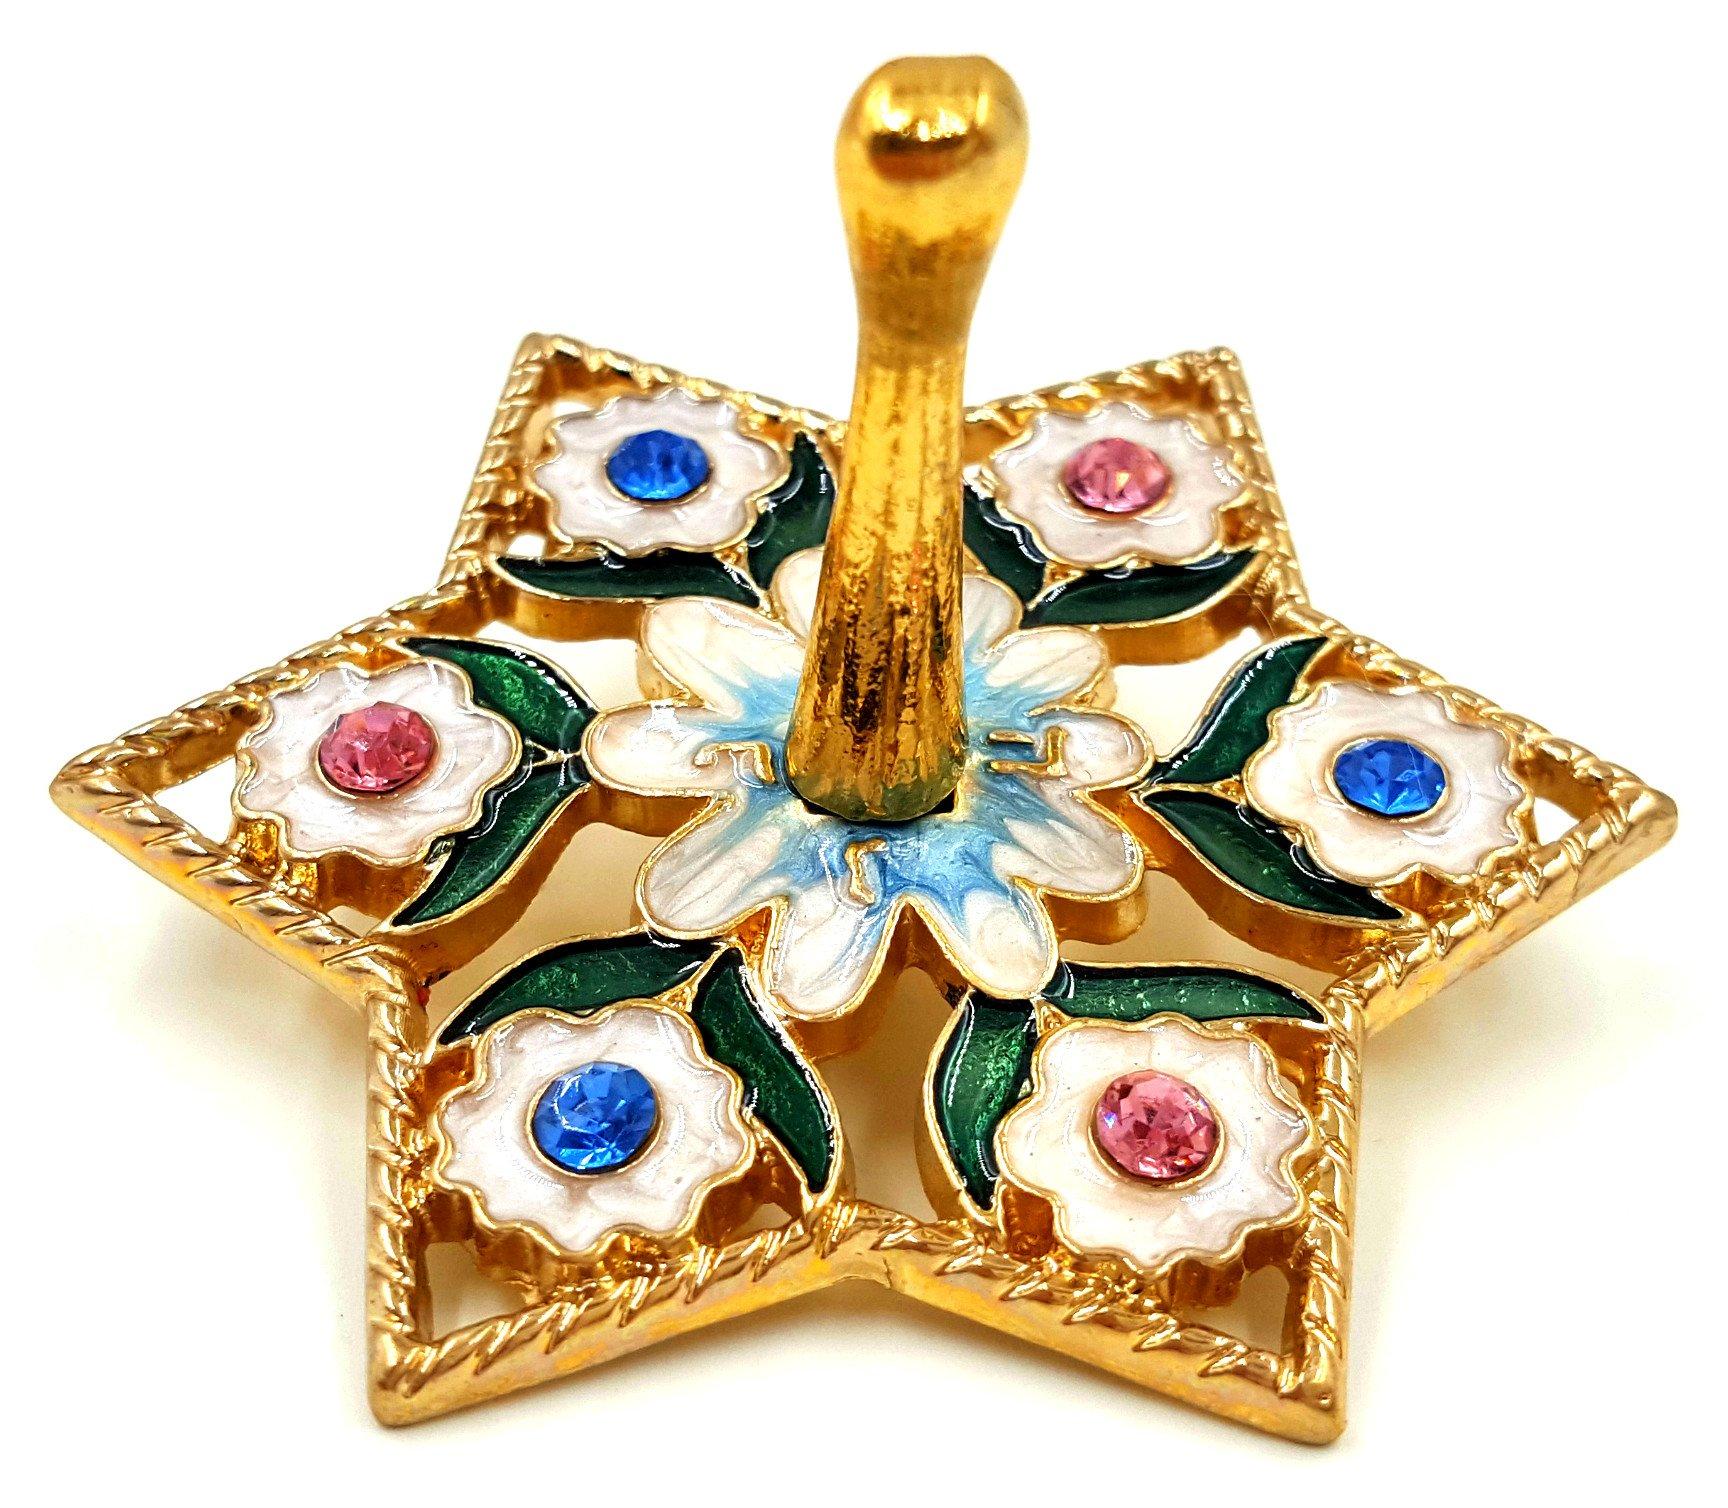 Gold Plated Hanukkah DREIDEL Chanukkah Sevivon With Crystals & Enamel Flowers Spinning Top Game From Israel